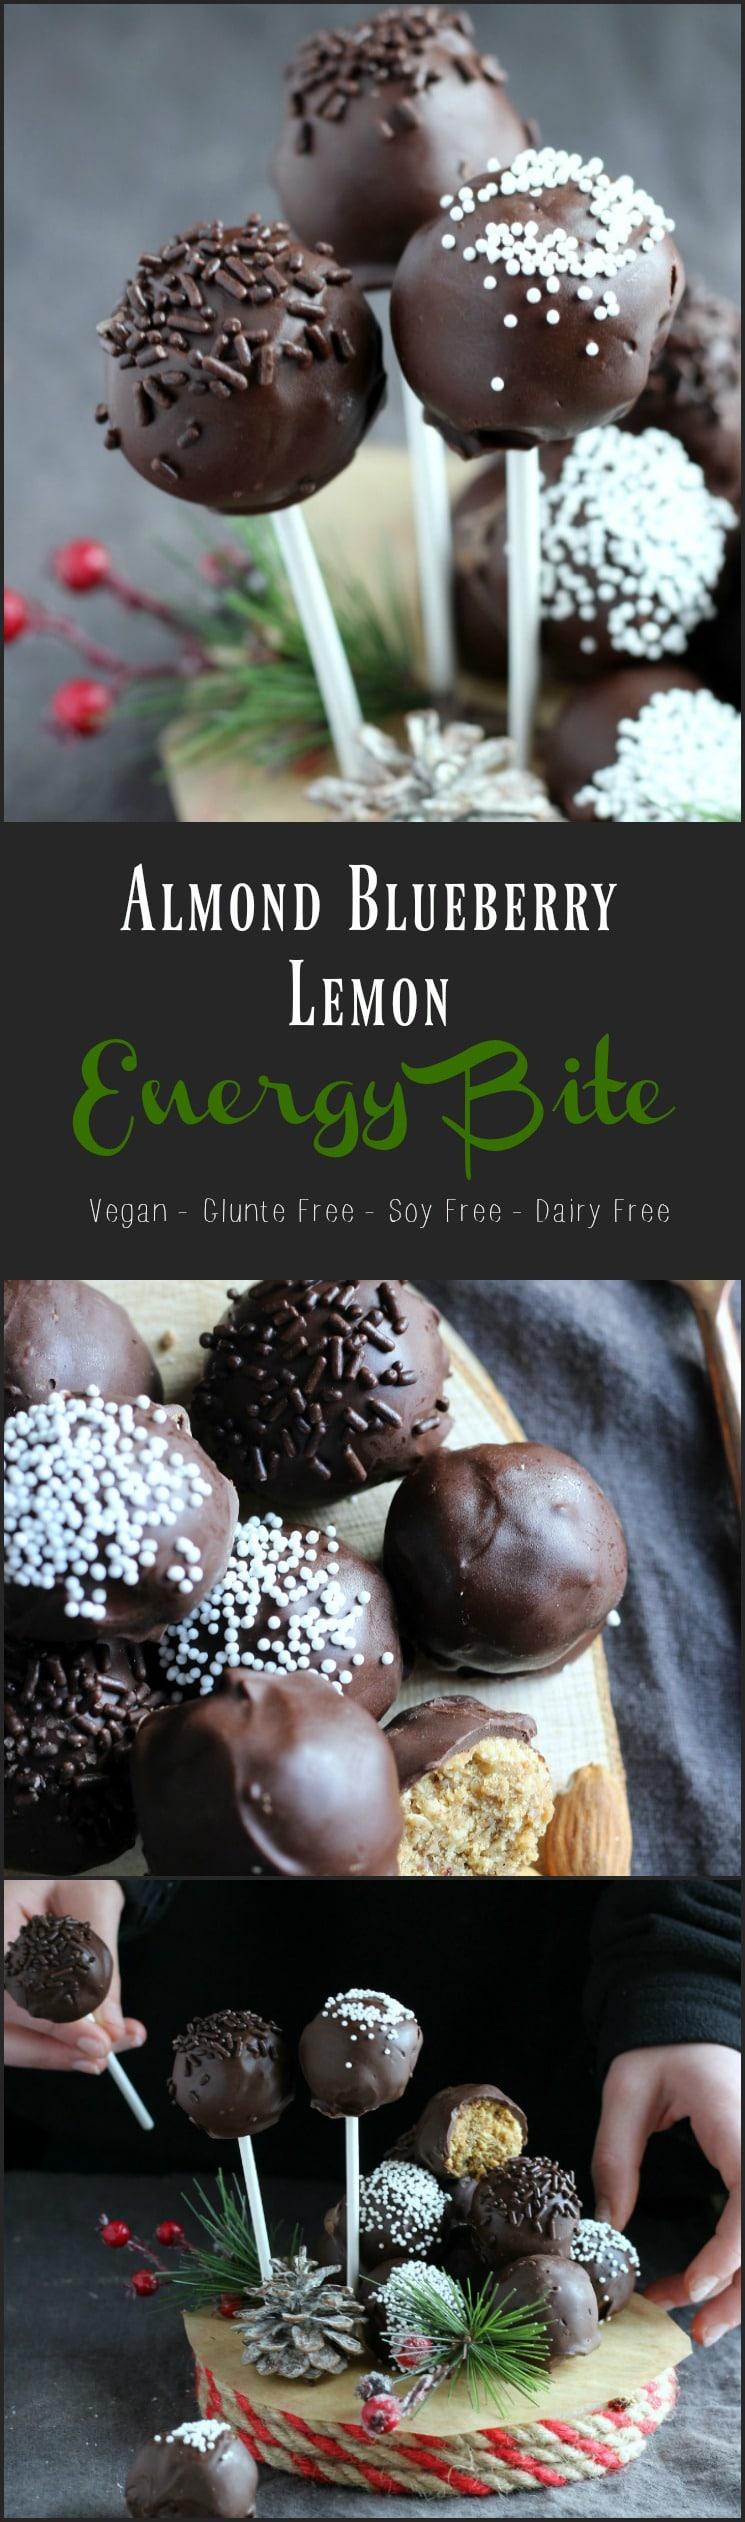 Almond Blueberry Lemon Chocolate Energy Bite the ULTIMATE Healthy Snack | gardeninthekitchen.com